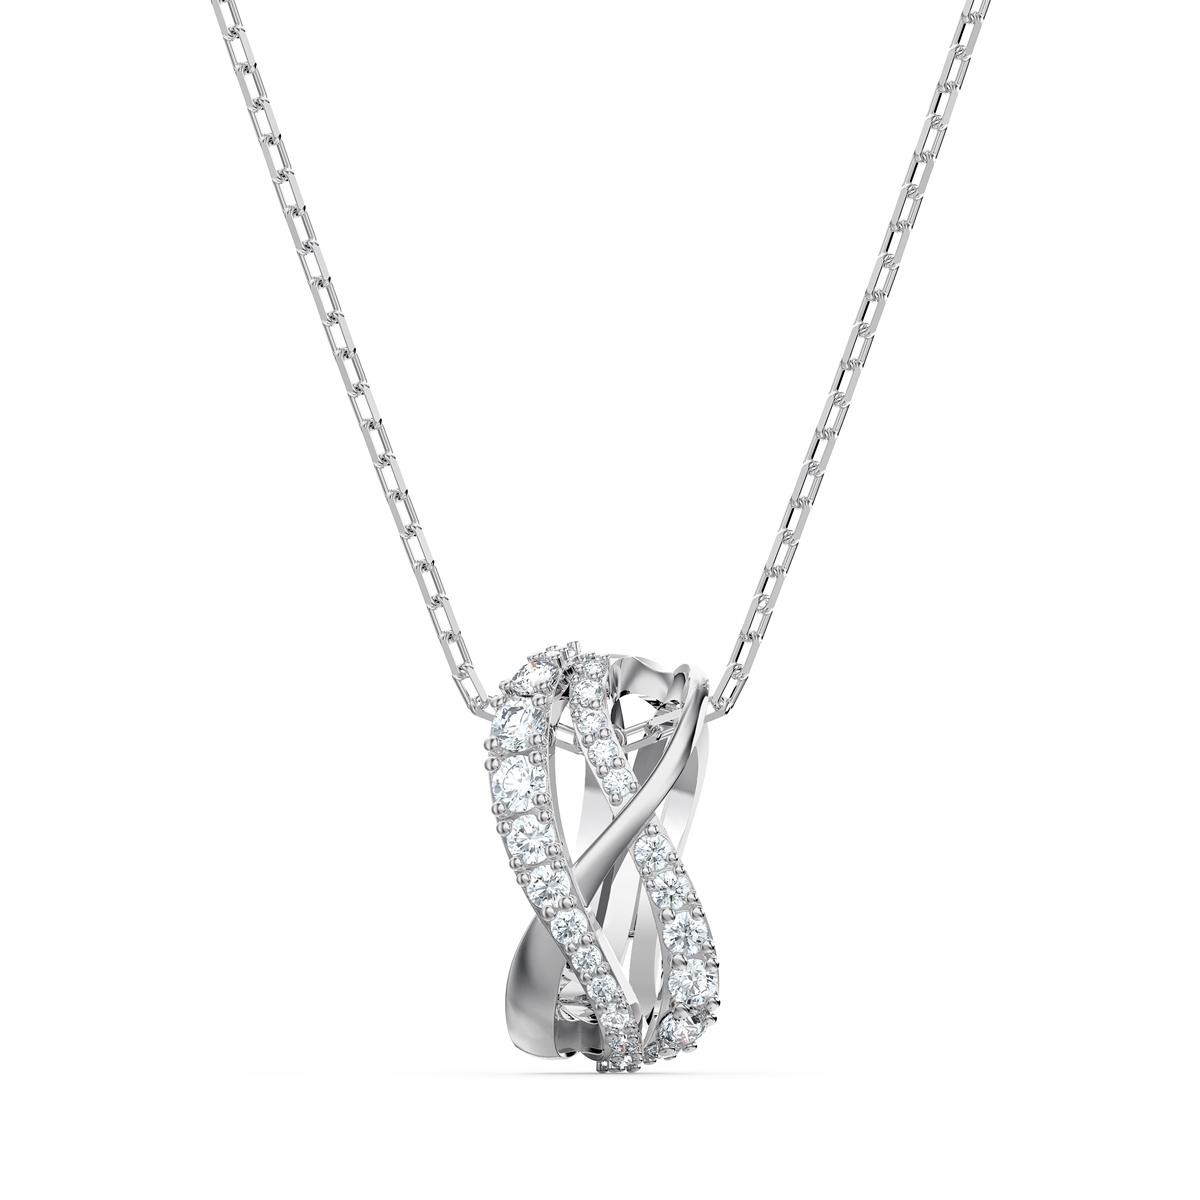 Swarovski Twist Rows Pendant Necklace, White, Rhodium Plated